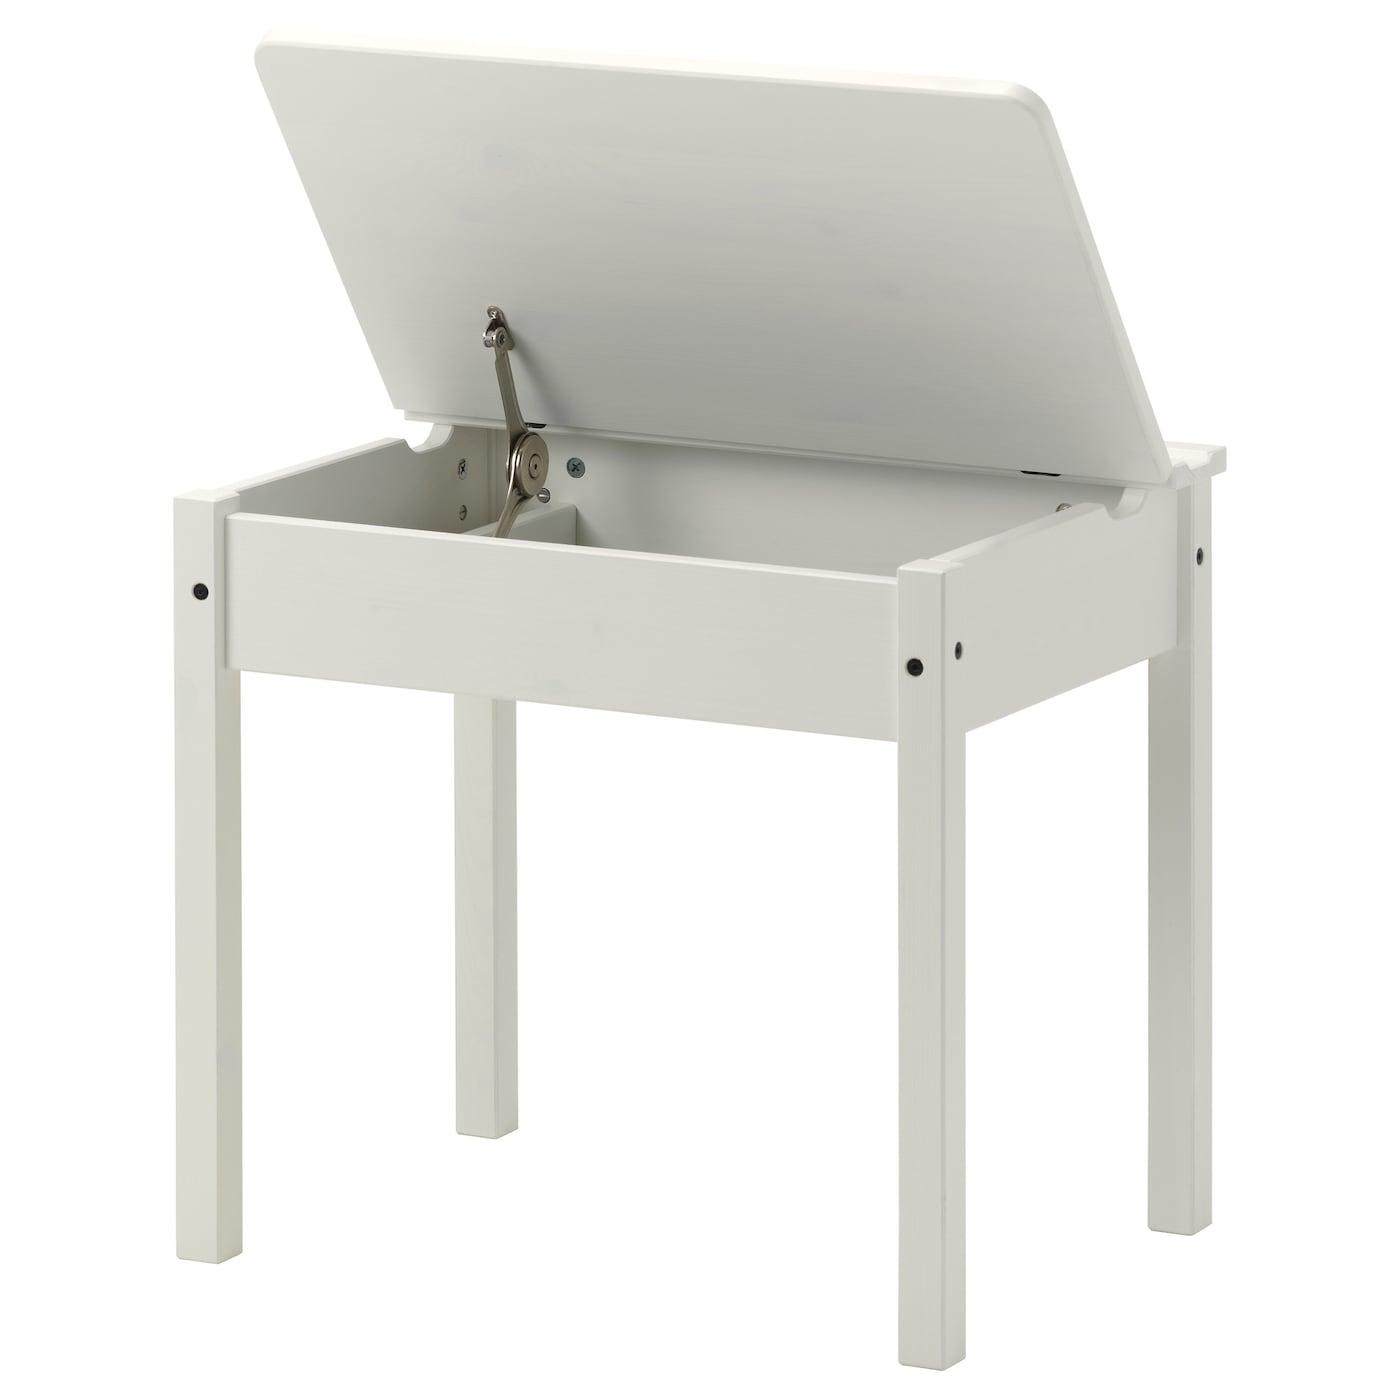 Stunning ikea sundvik childrenus desk with range couverts ikea - Couvert de table ikea ...